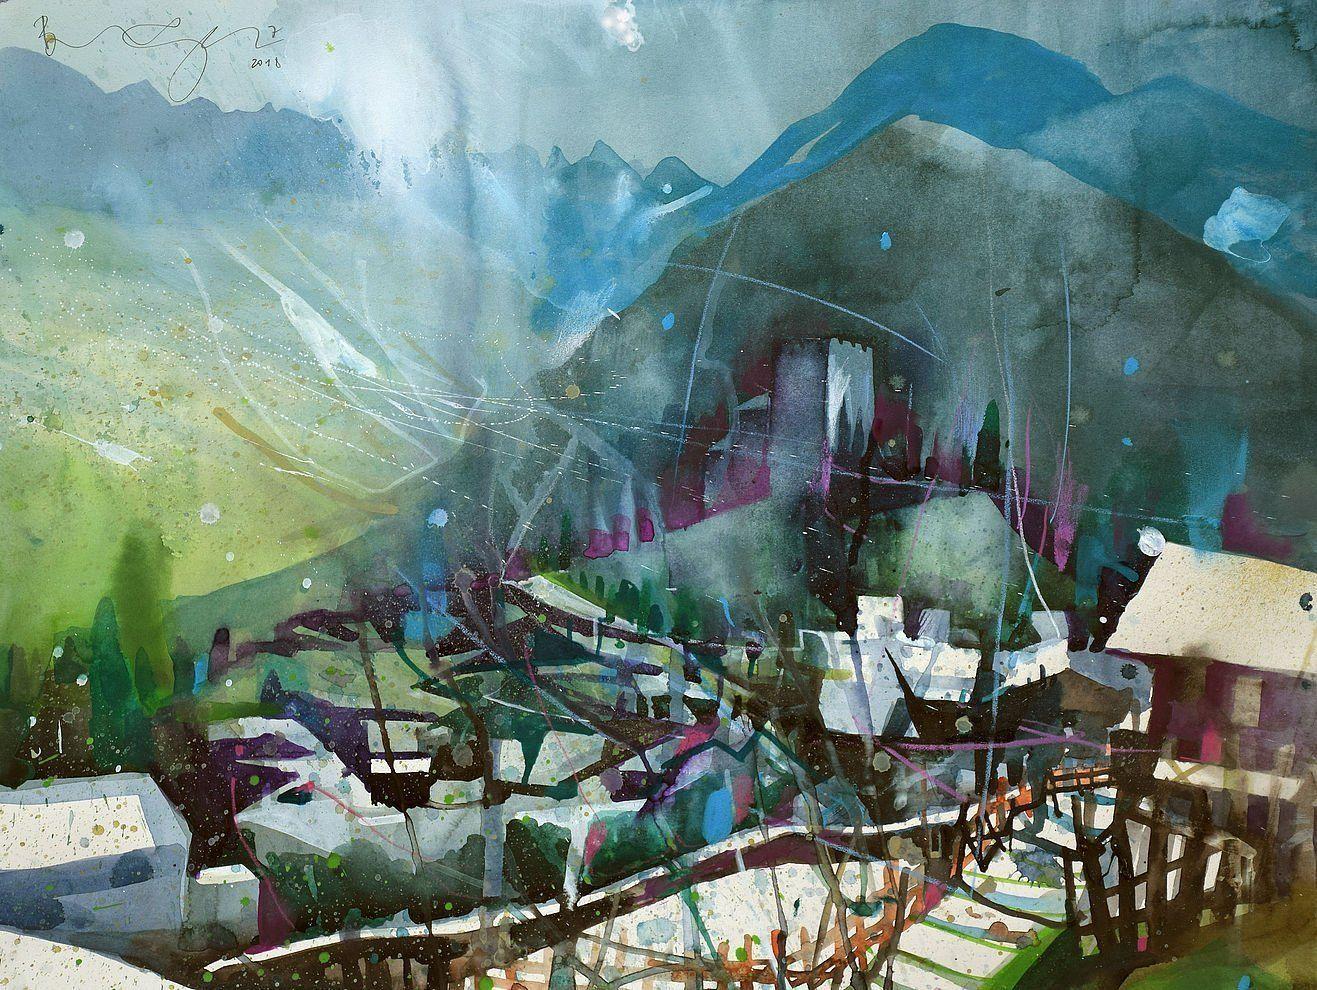 Werke Bernhard Vogel Painting Art Aquarium